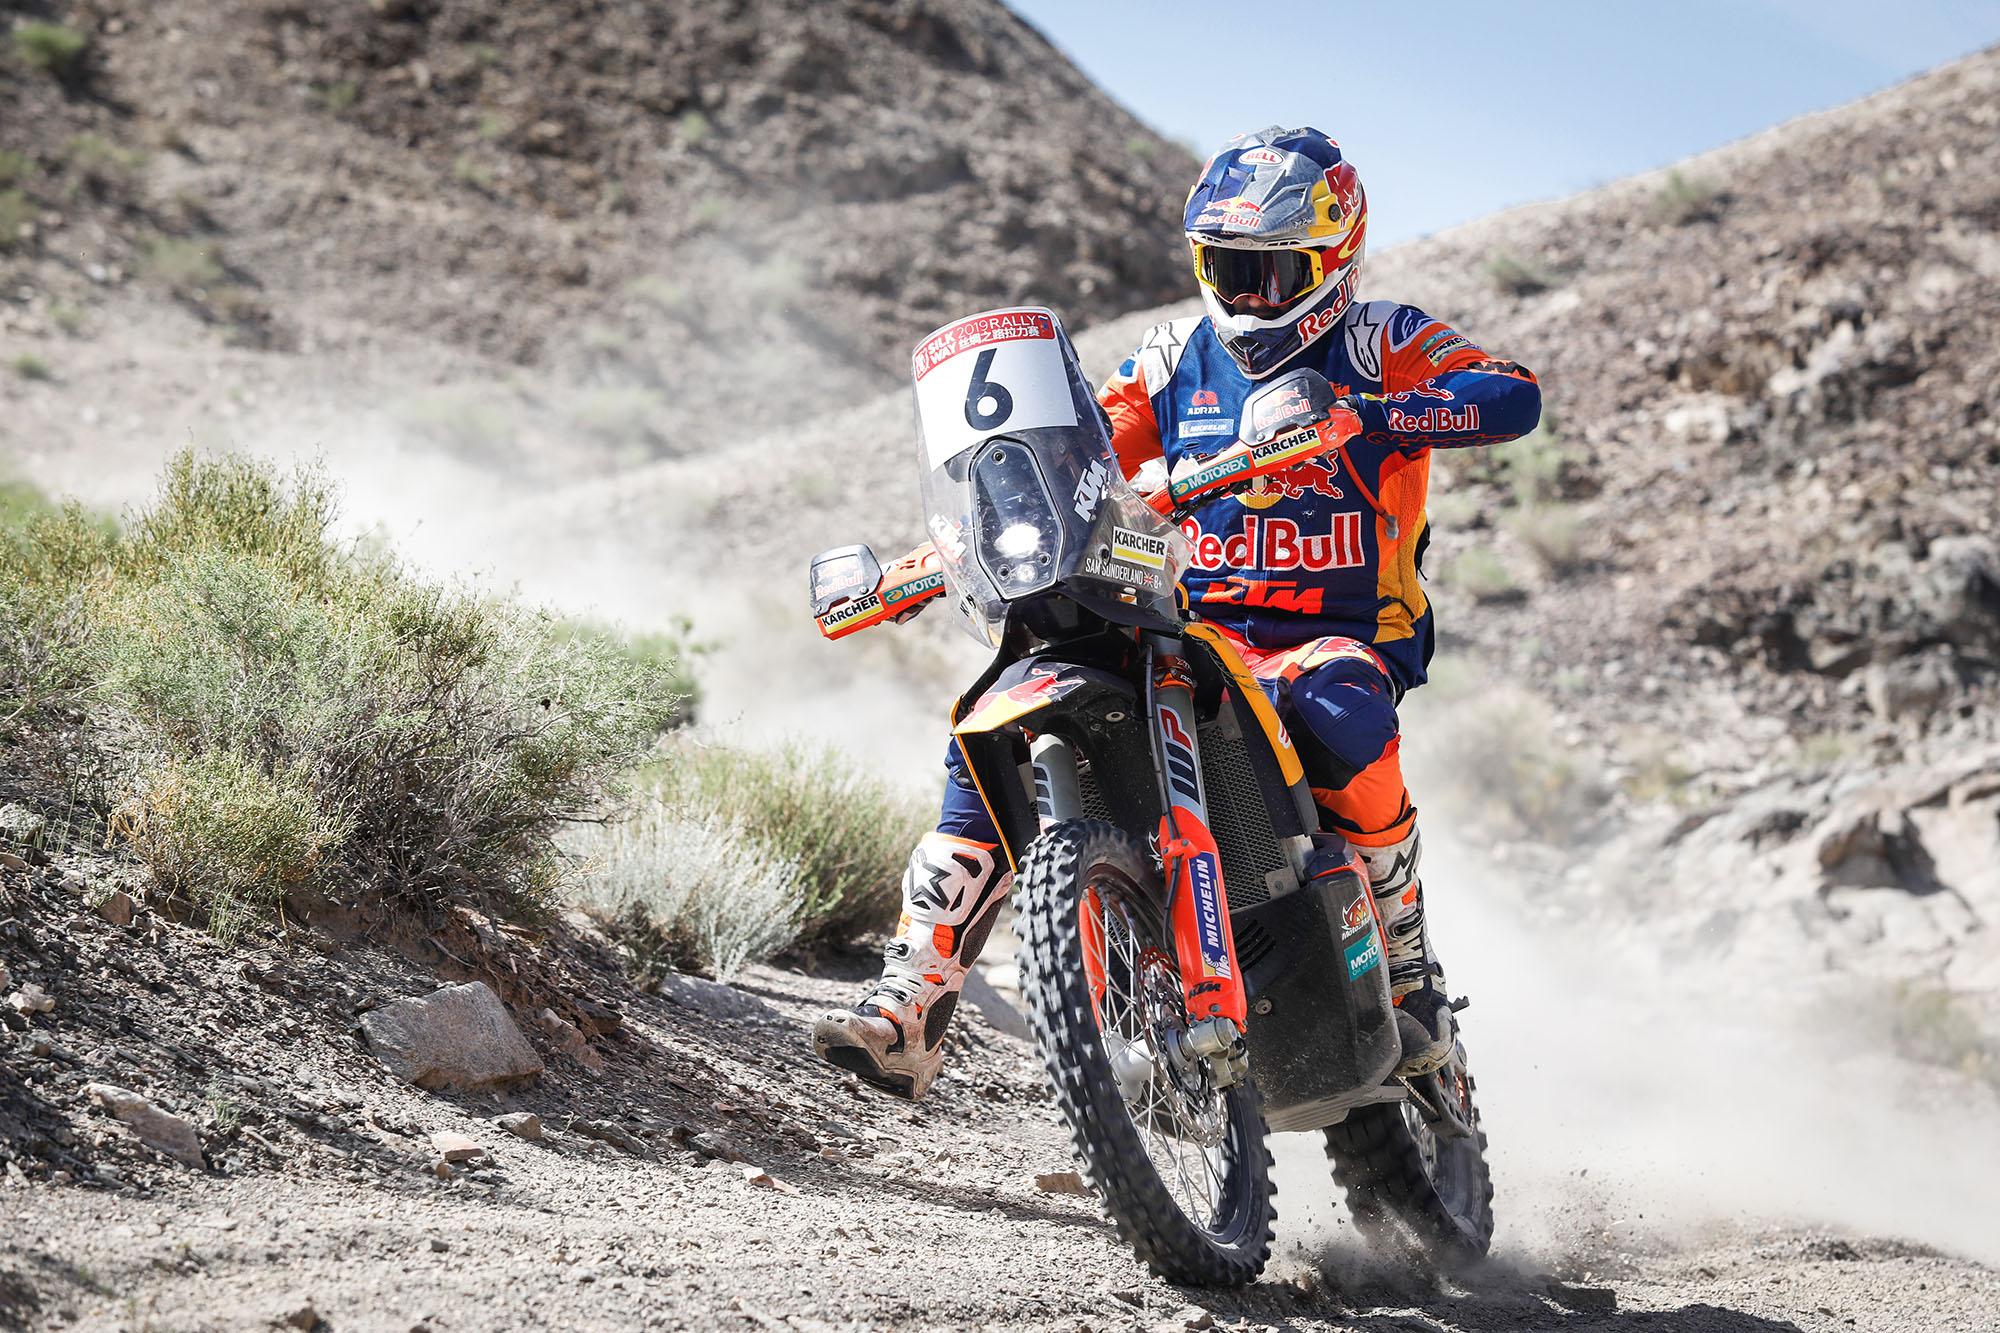 2019-silk-way-rally-ss10-westx1000_U8A4316.jpg